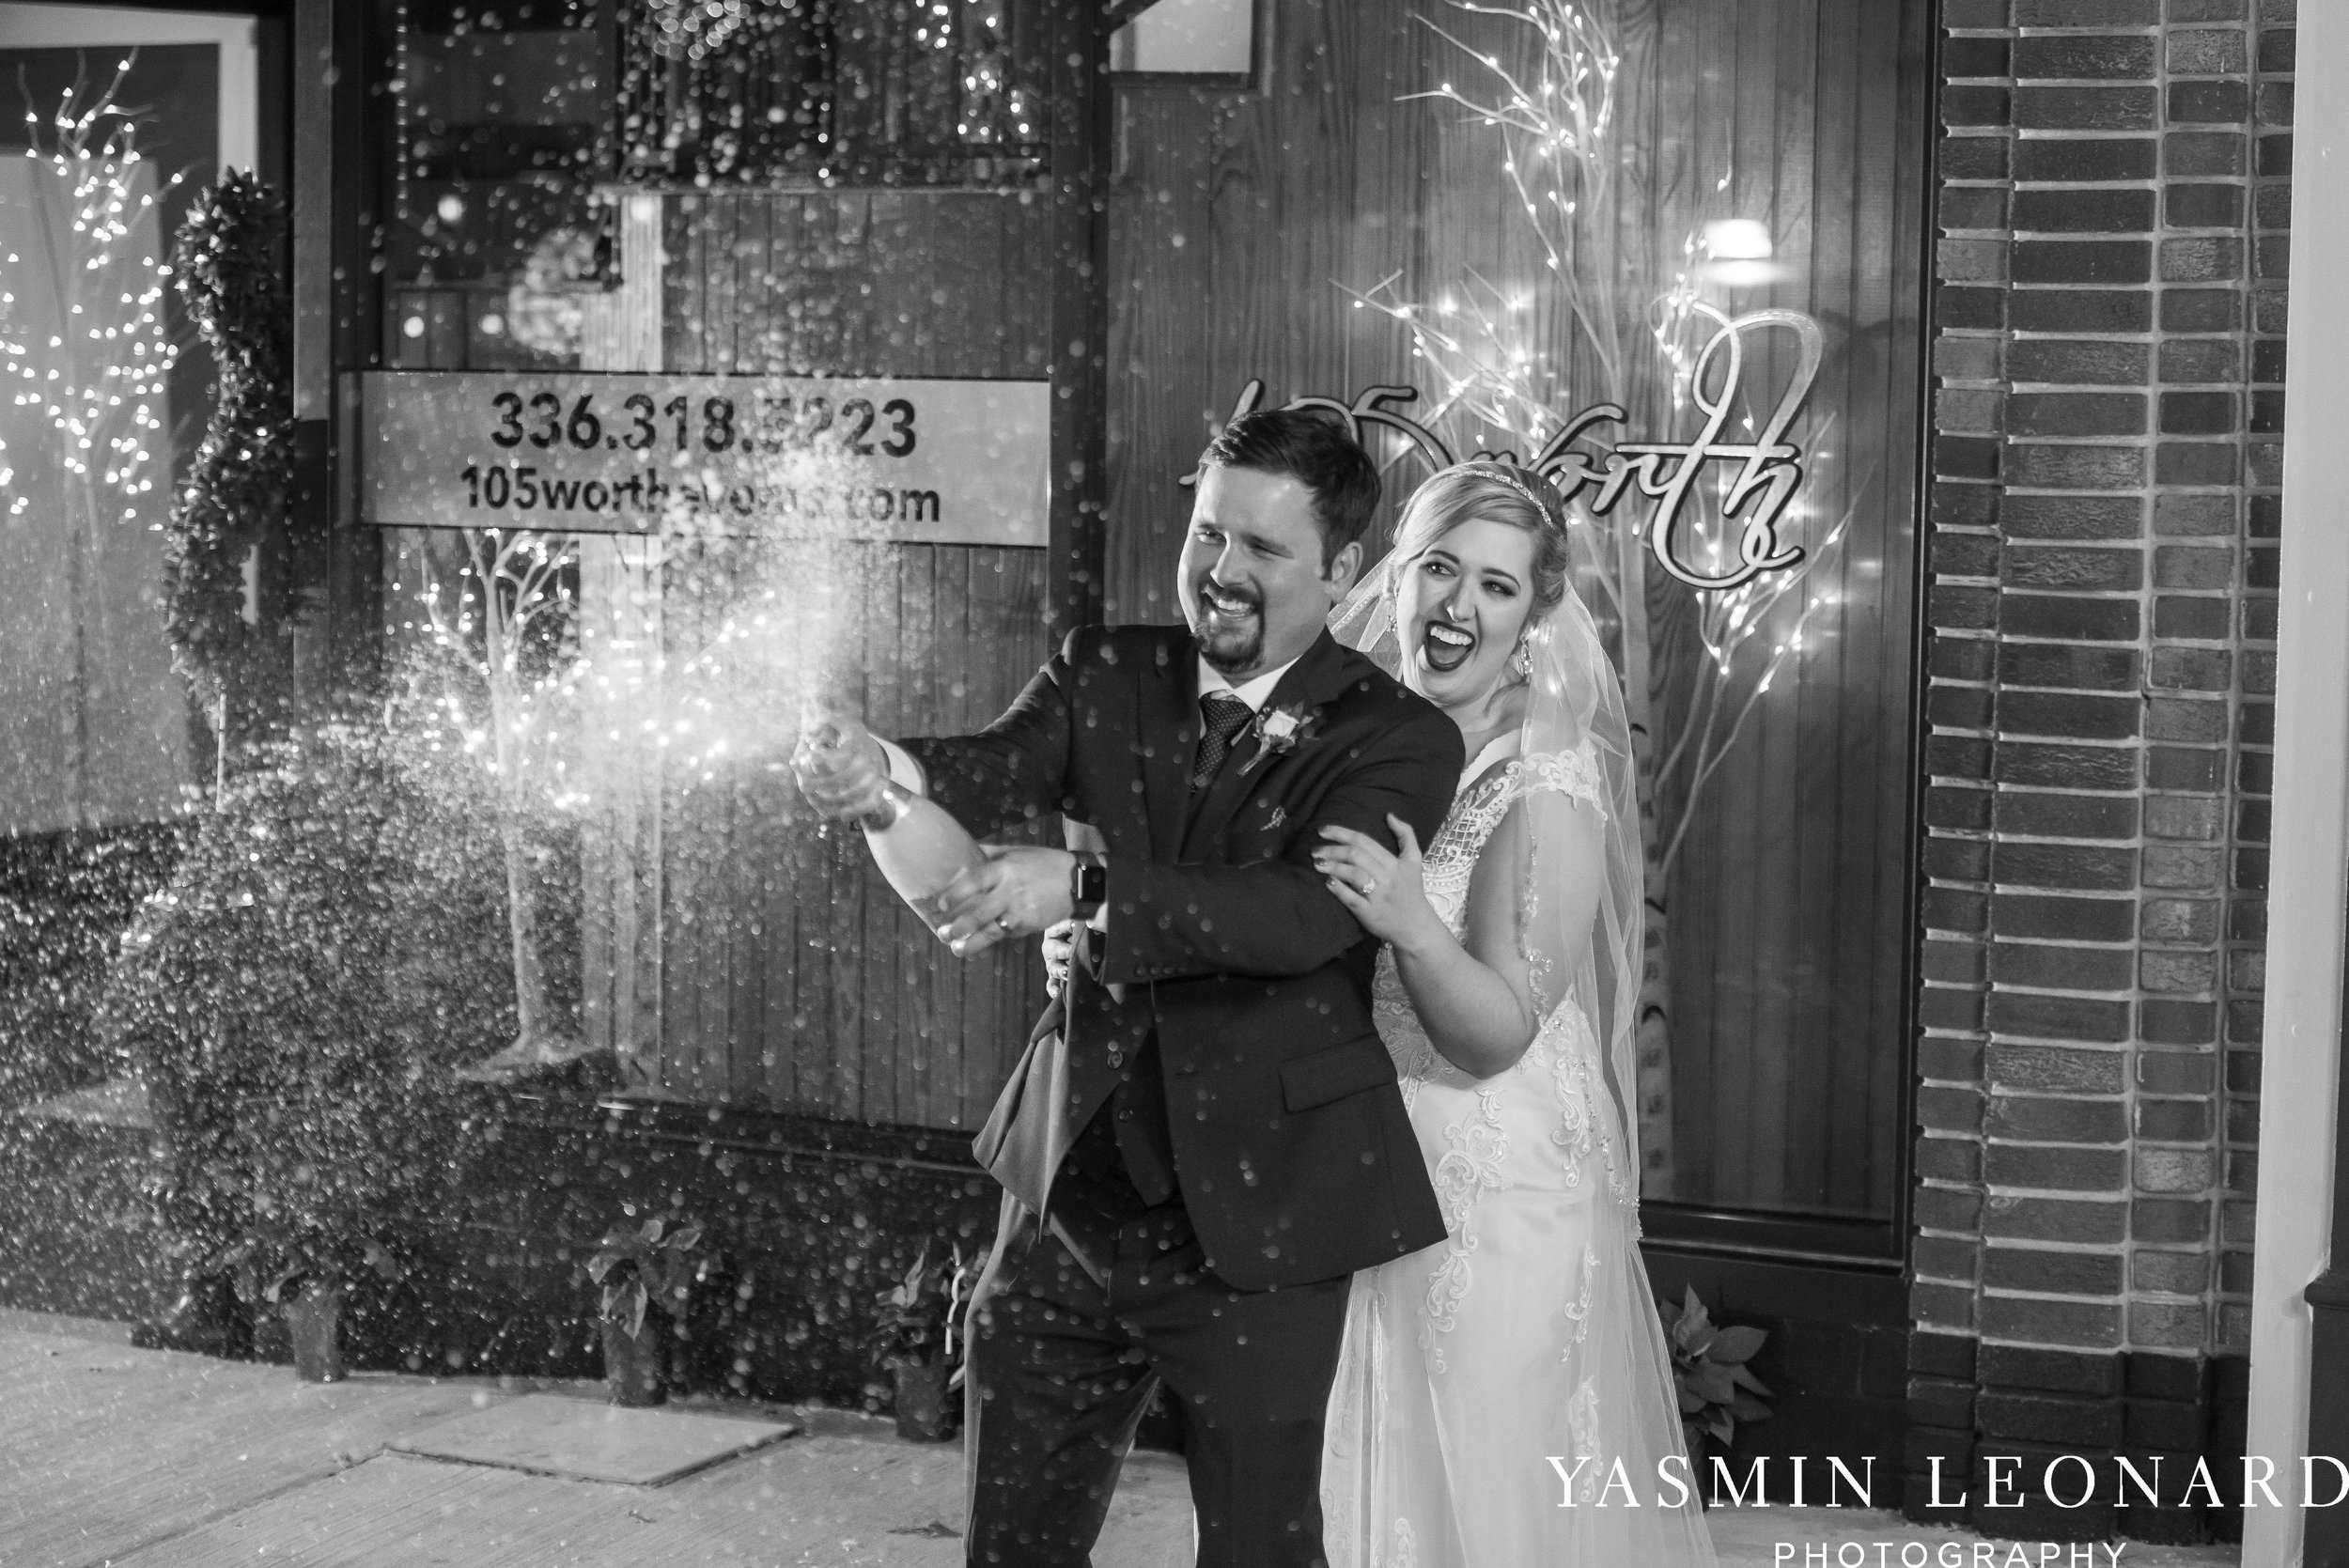 Rebekah and Matt - 105 Worth Event Centre - Yasmin Leonard Photography - Asheboro Wedding - NC Wedding - High Point Weddings - Triad Weddings - Winter Wedding-44.jpg